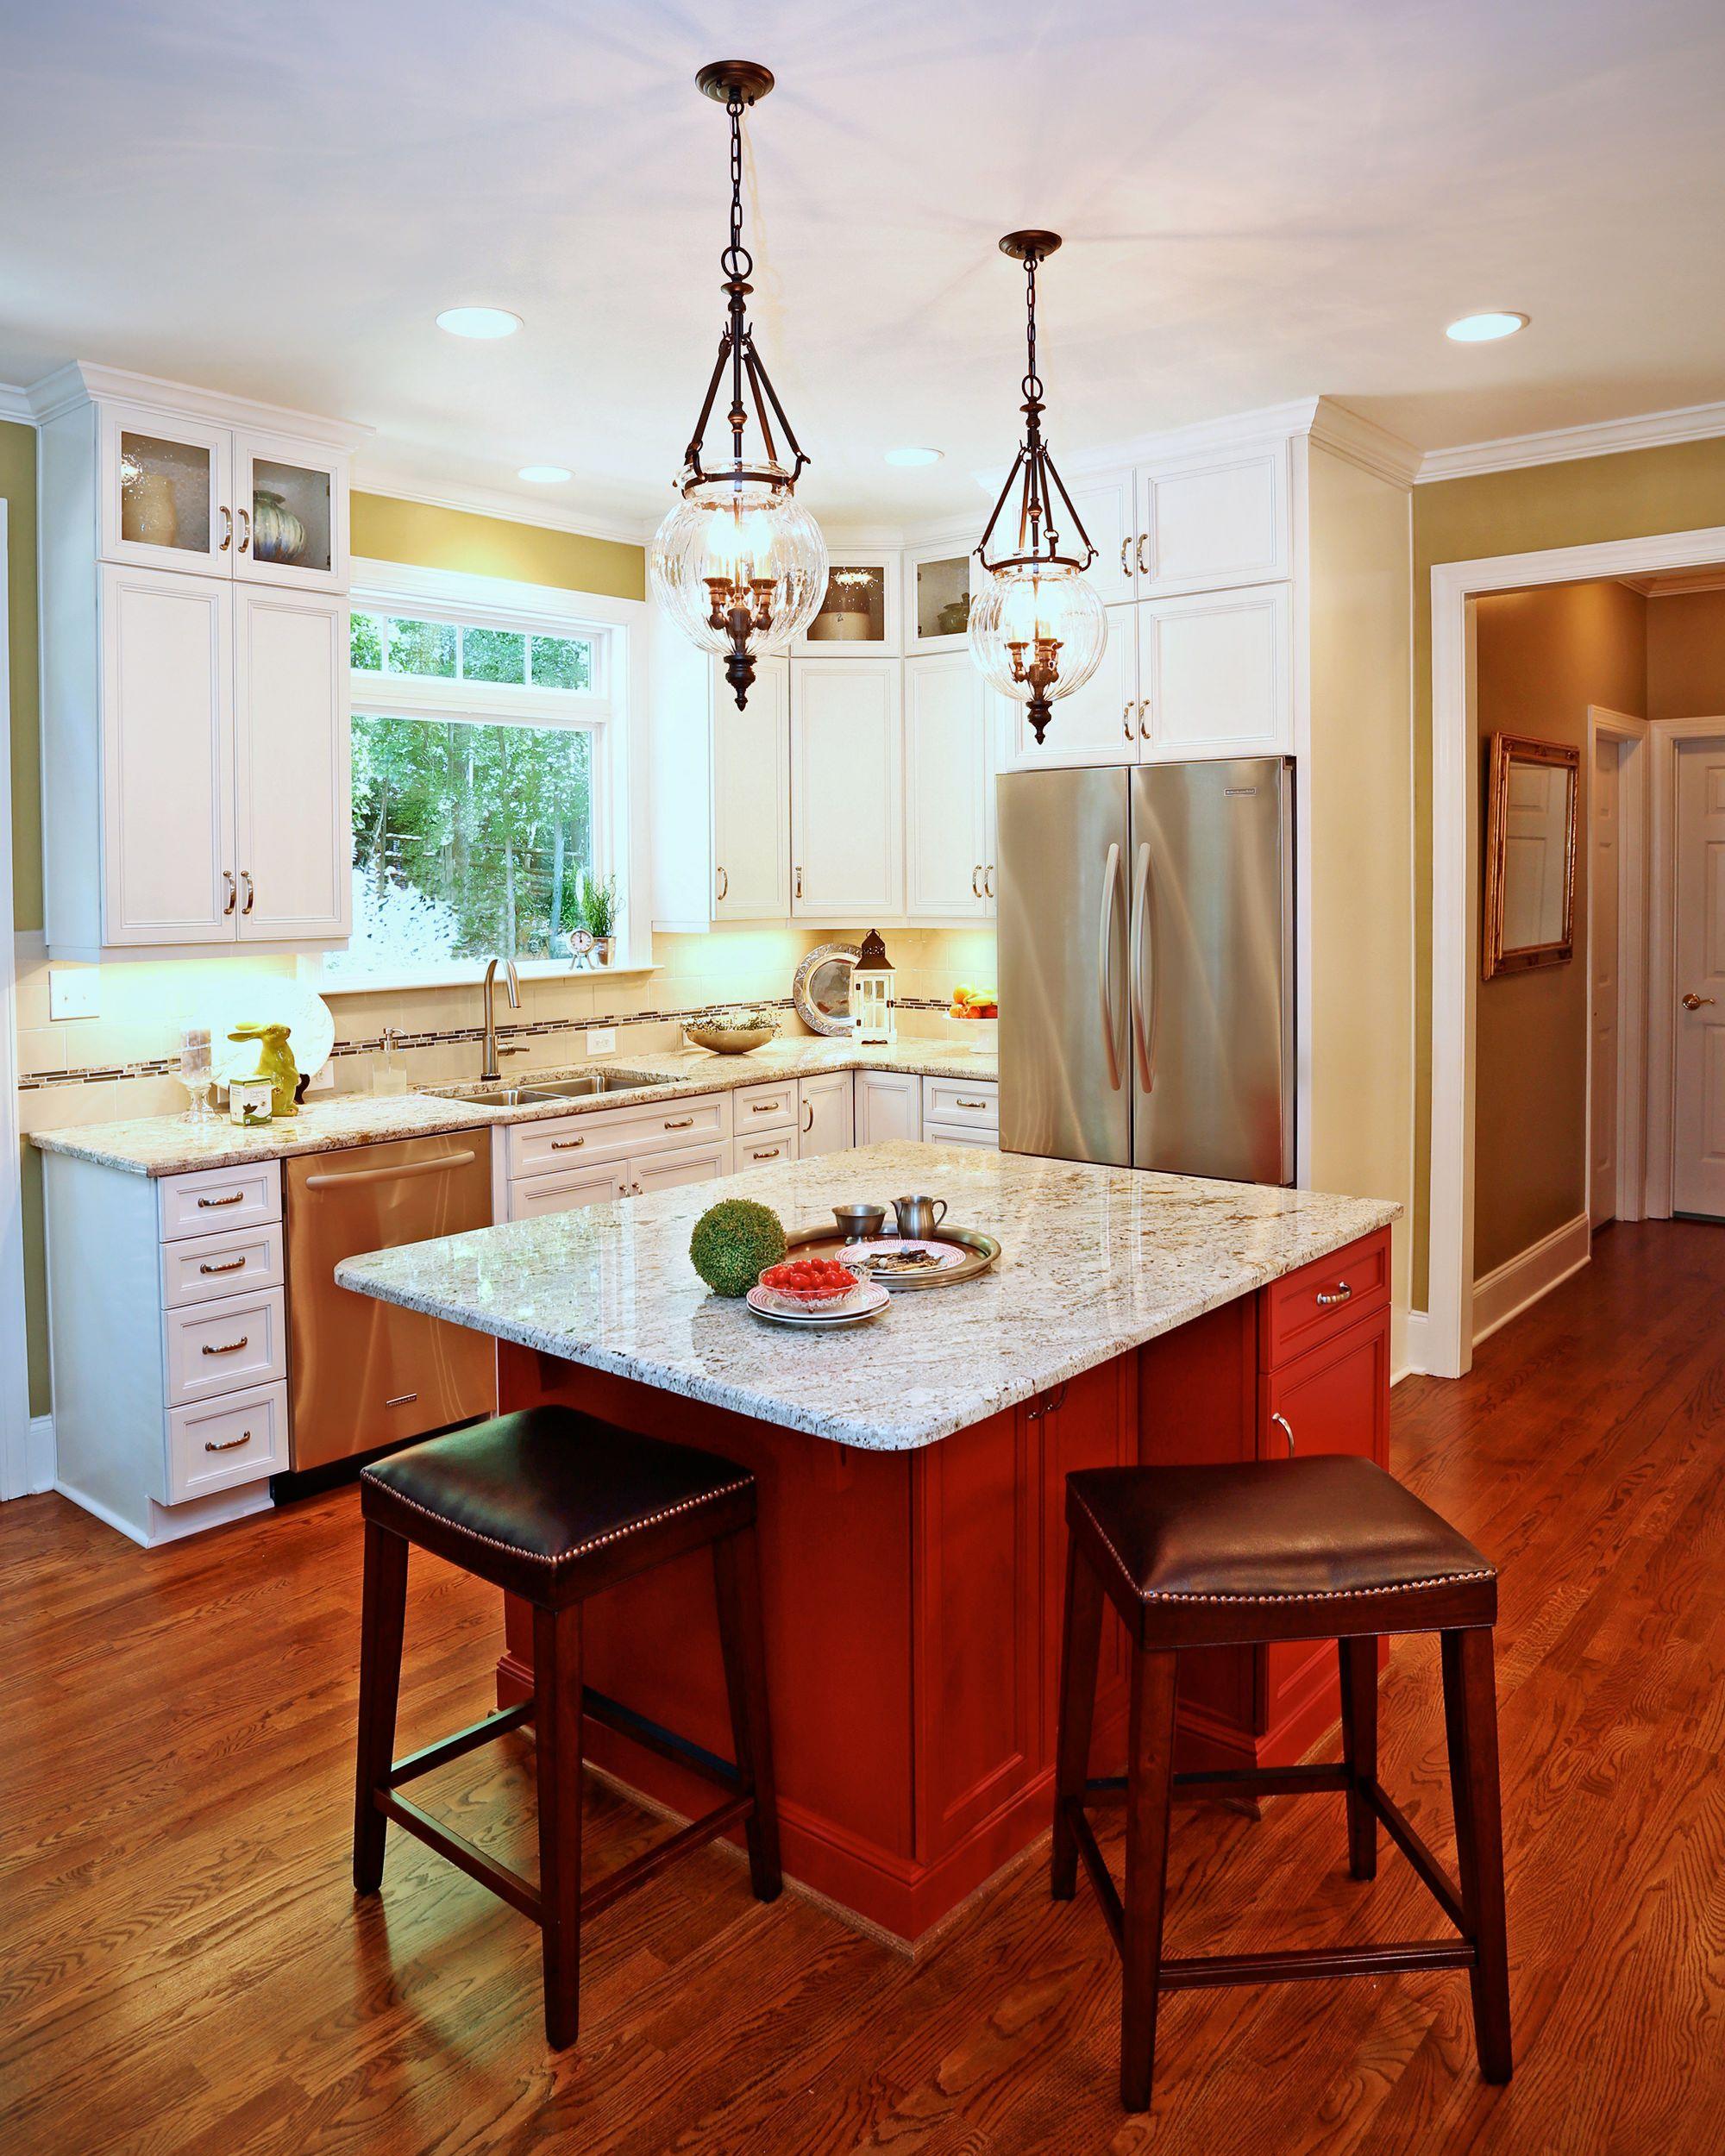 Barham Kitchen - North Carolina Kitchen Remodeling ...